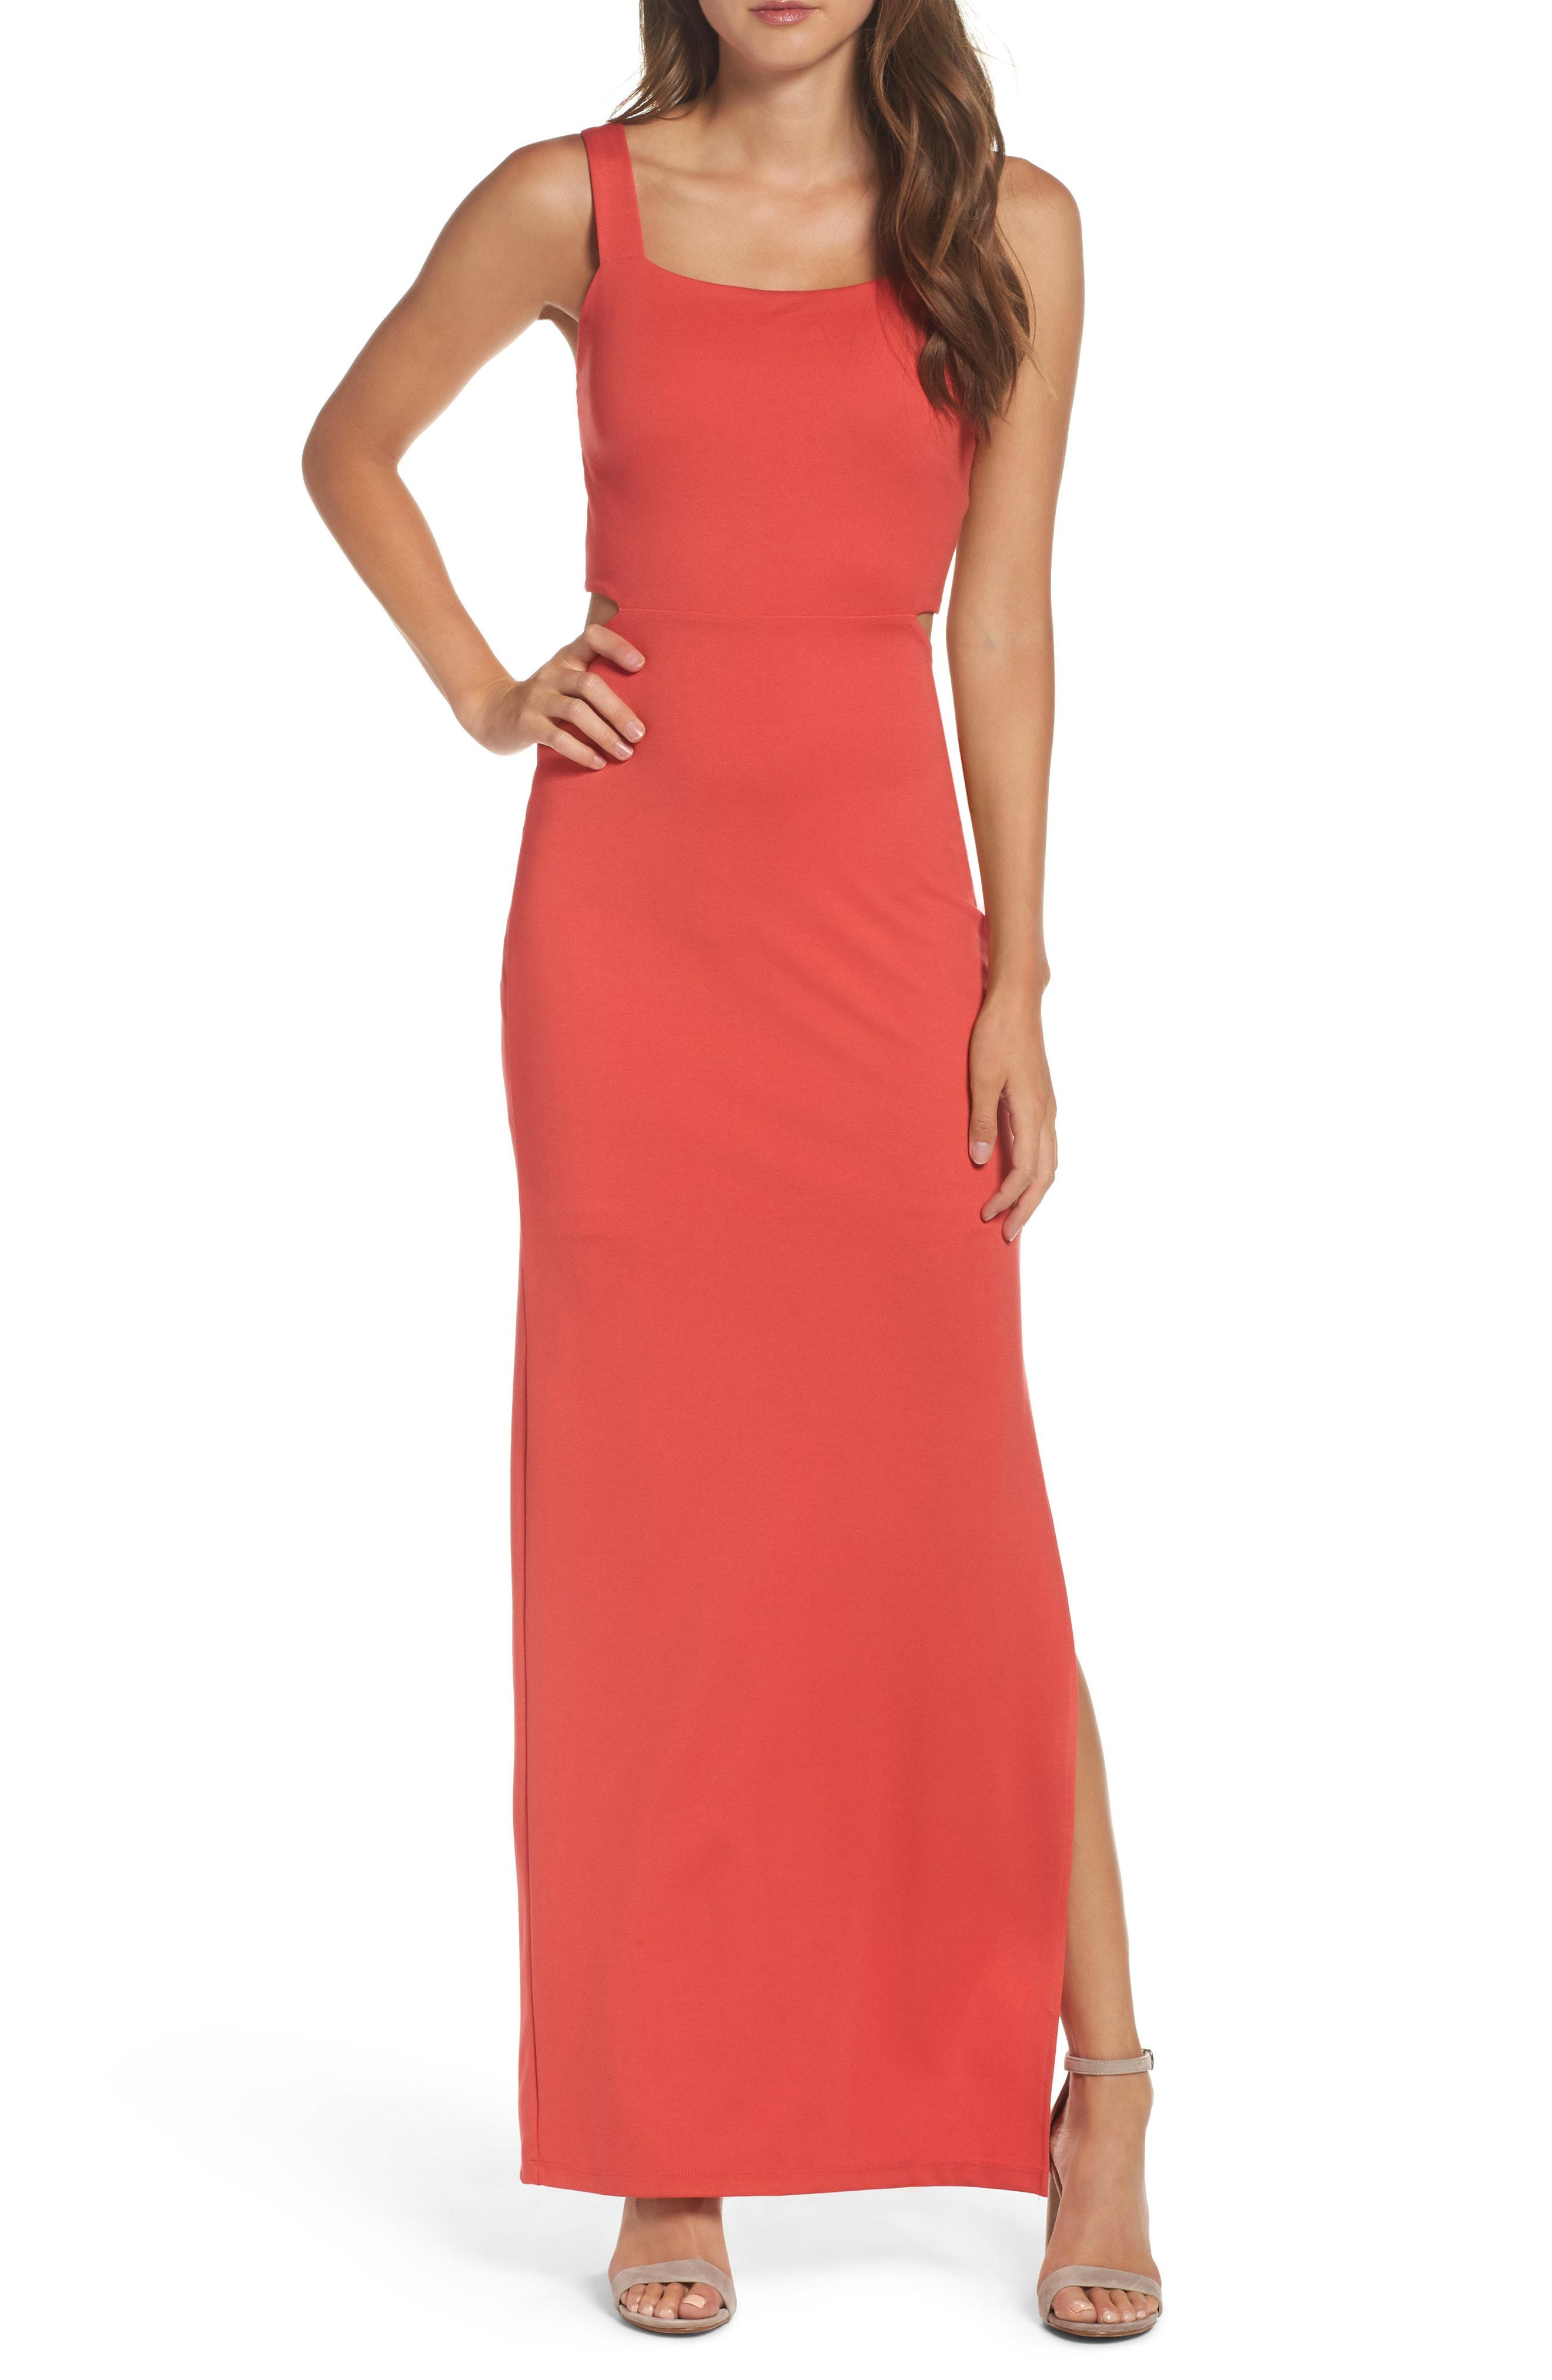 a4609a318b92 Lyst - Fraiche By J Maxi Dress in Red